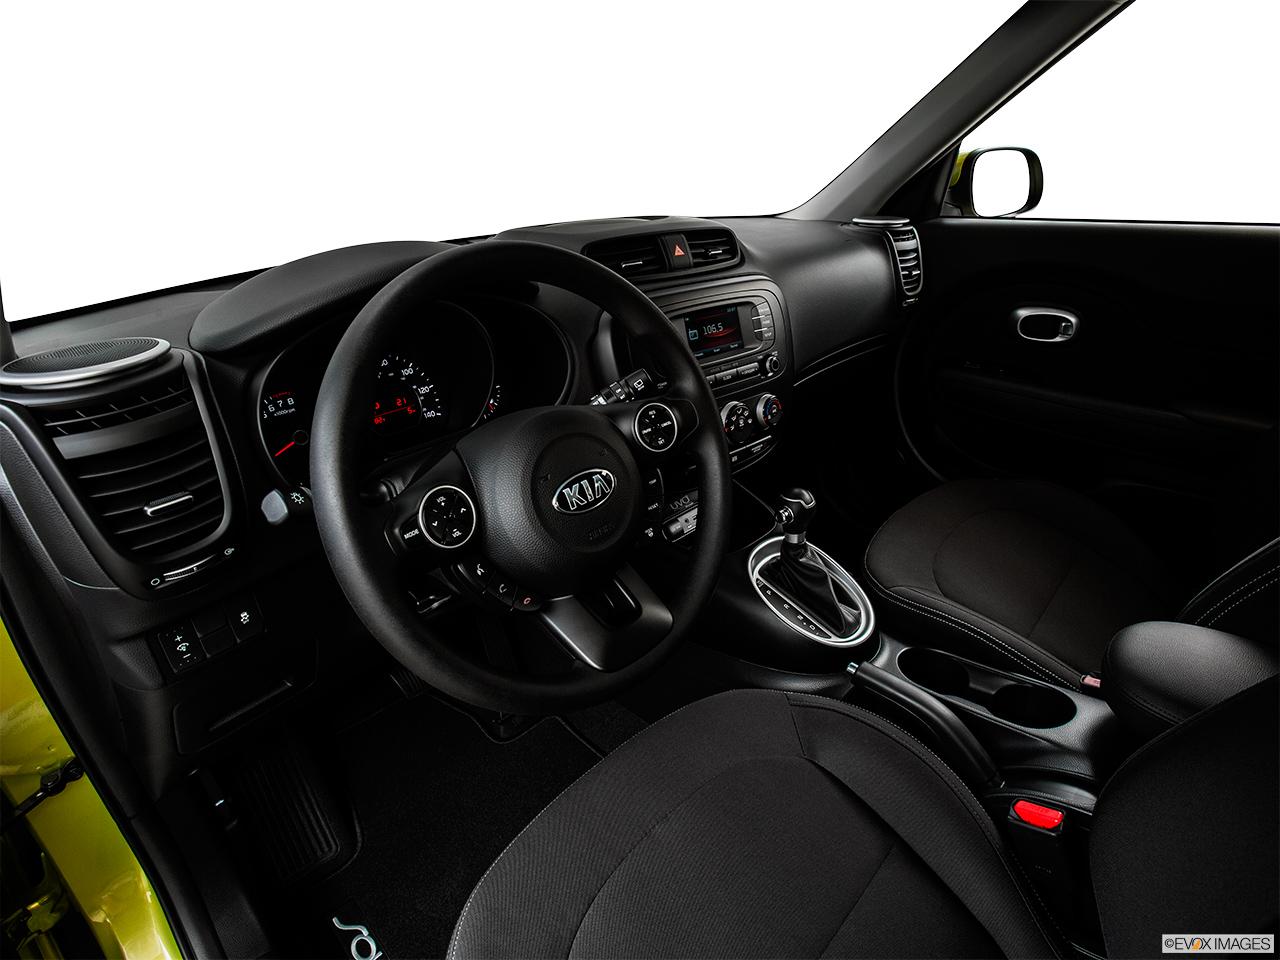 2015 kia soul base interior. 2015 kia soul 5 door auto base wagon interior hero driveru0027s side